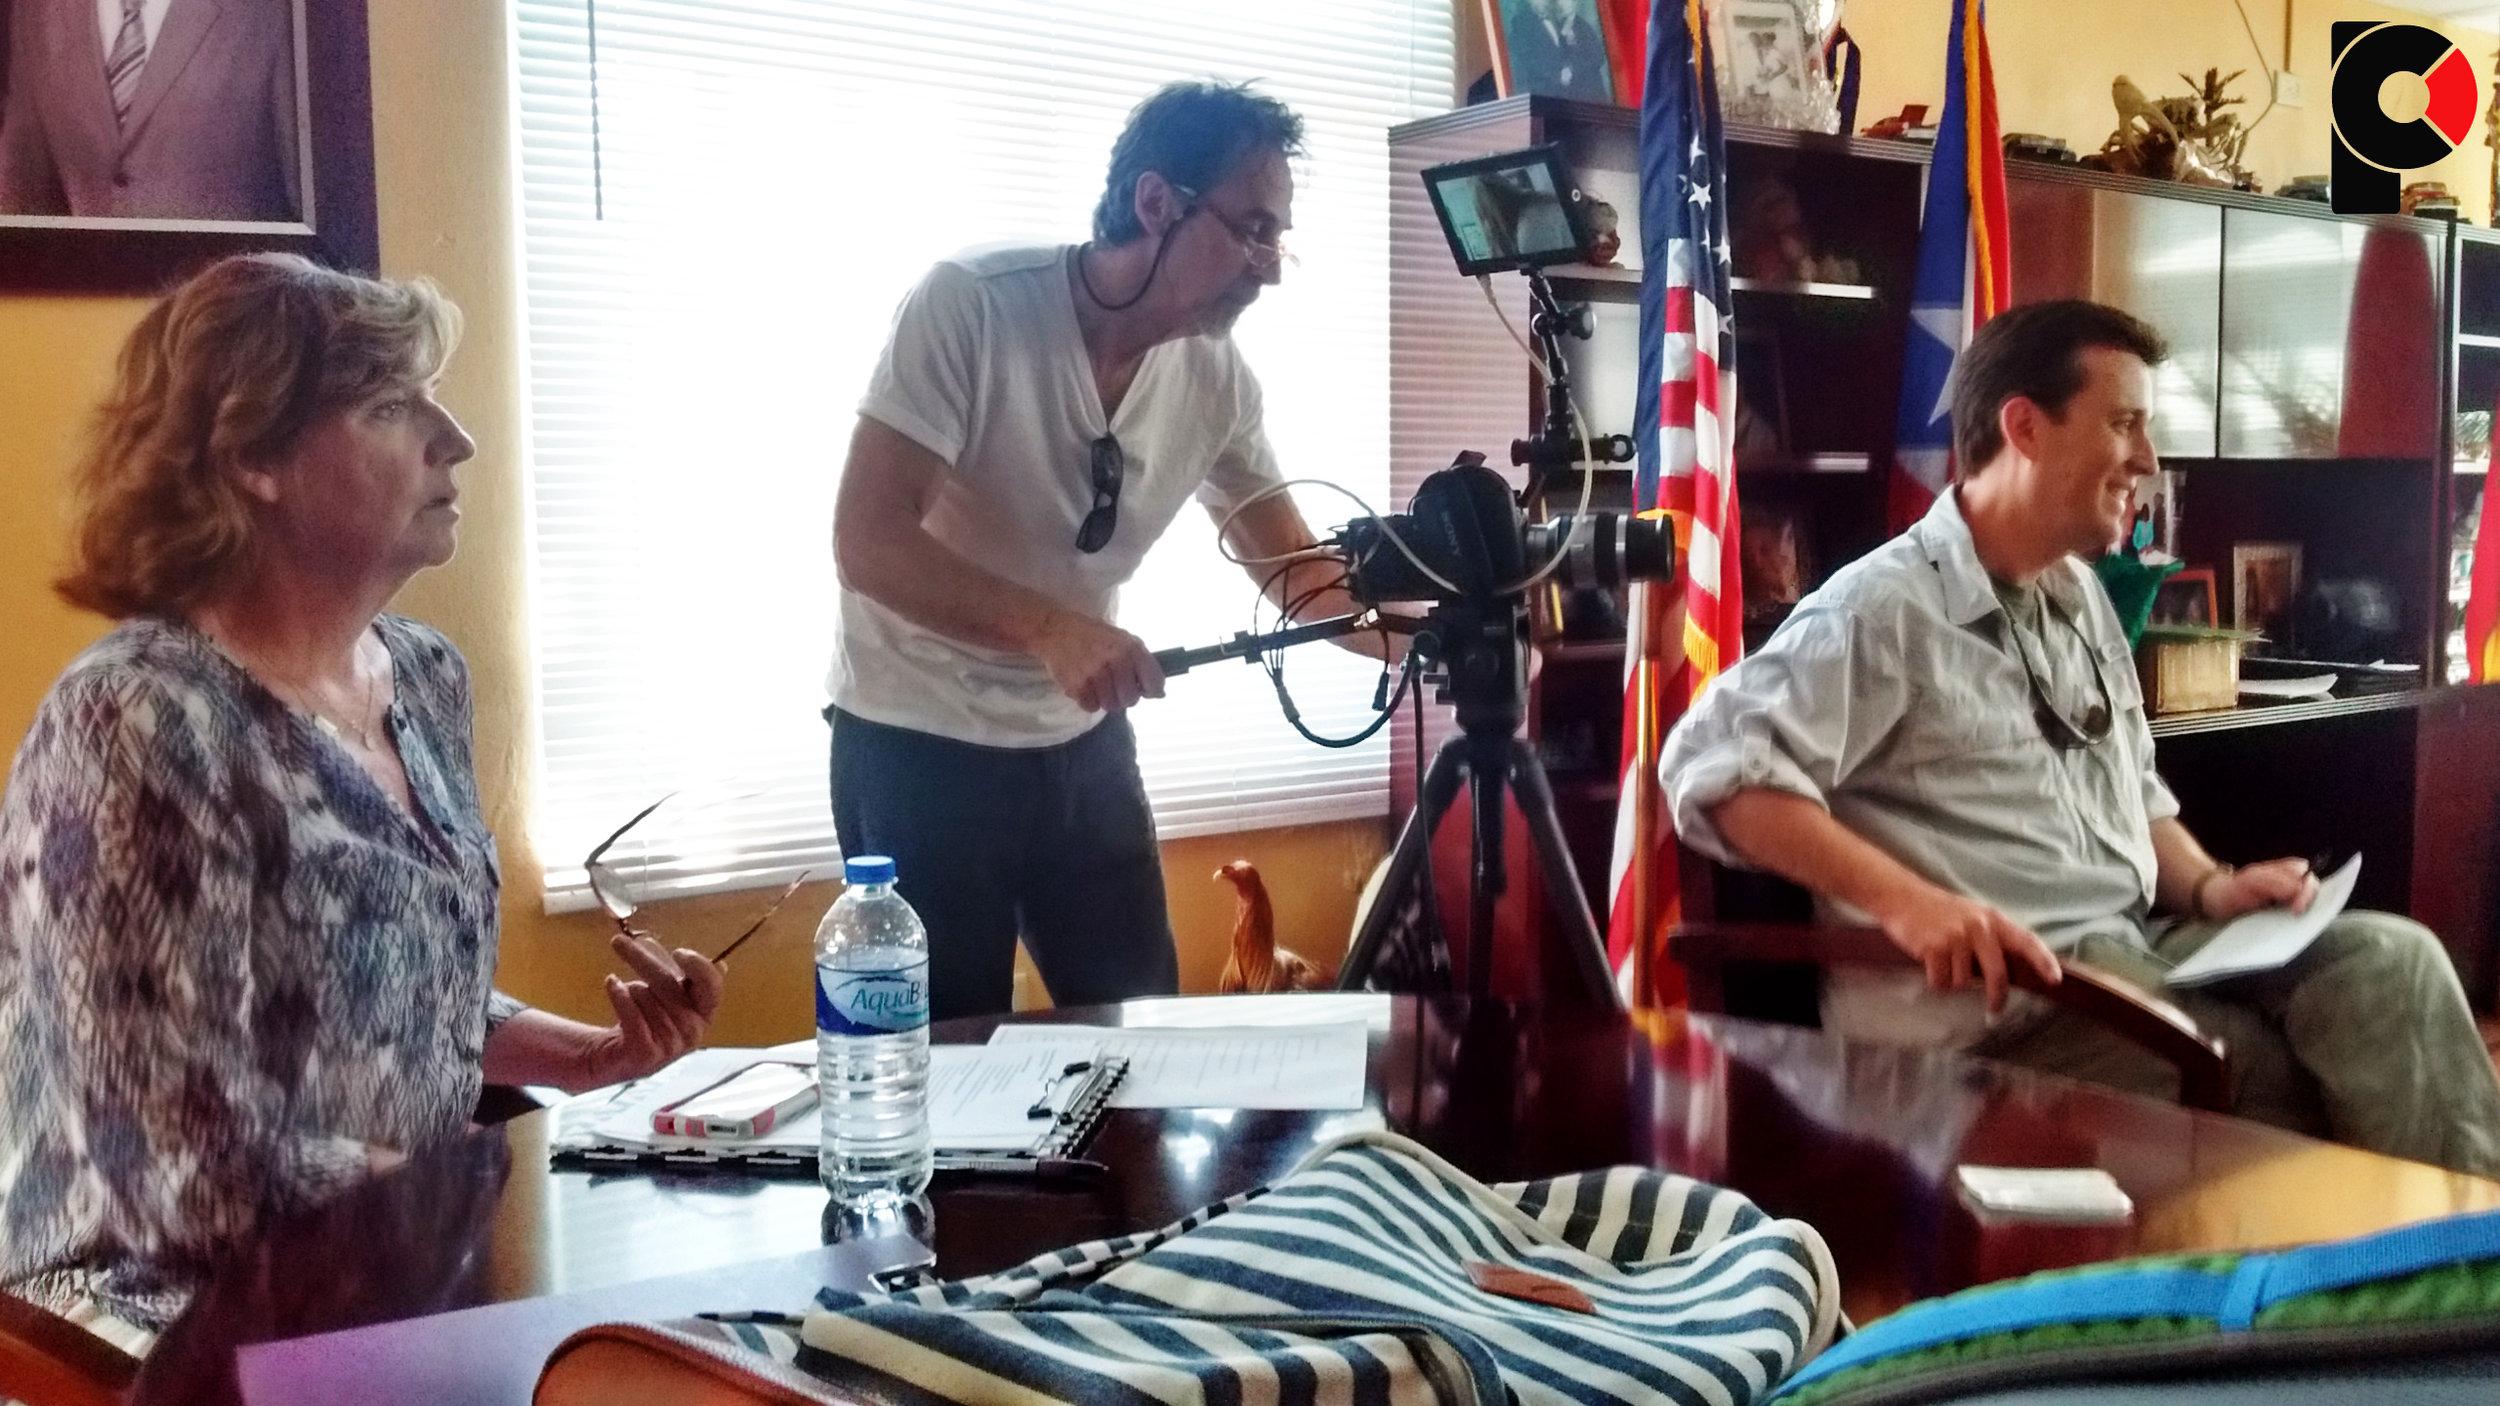 Patricia Cook, Executive Producer, Gary Geboy, Alejandro Muzio, interviewer.